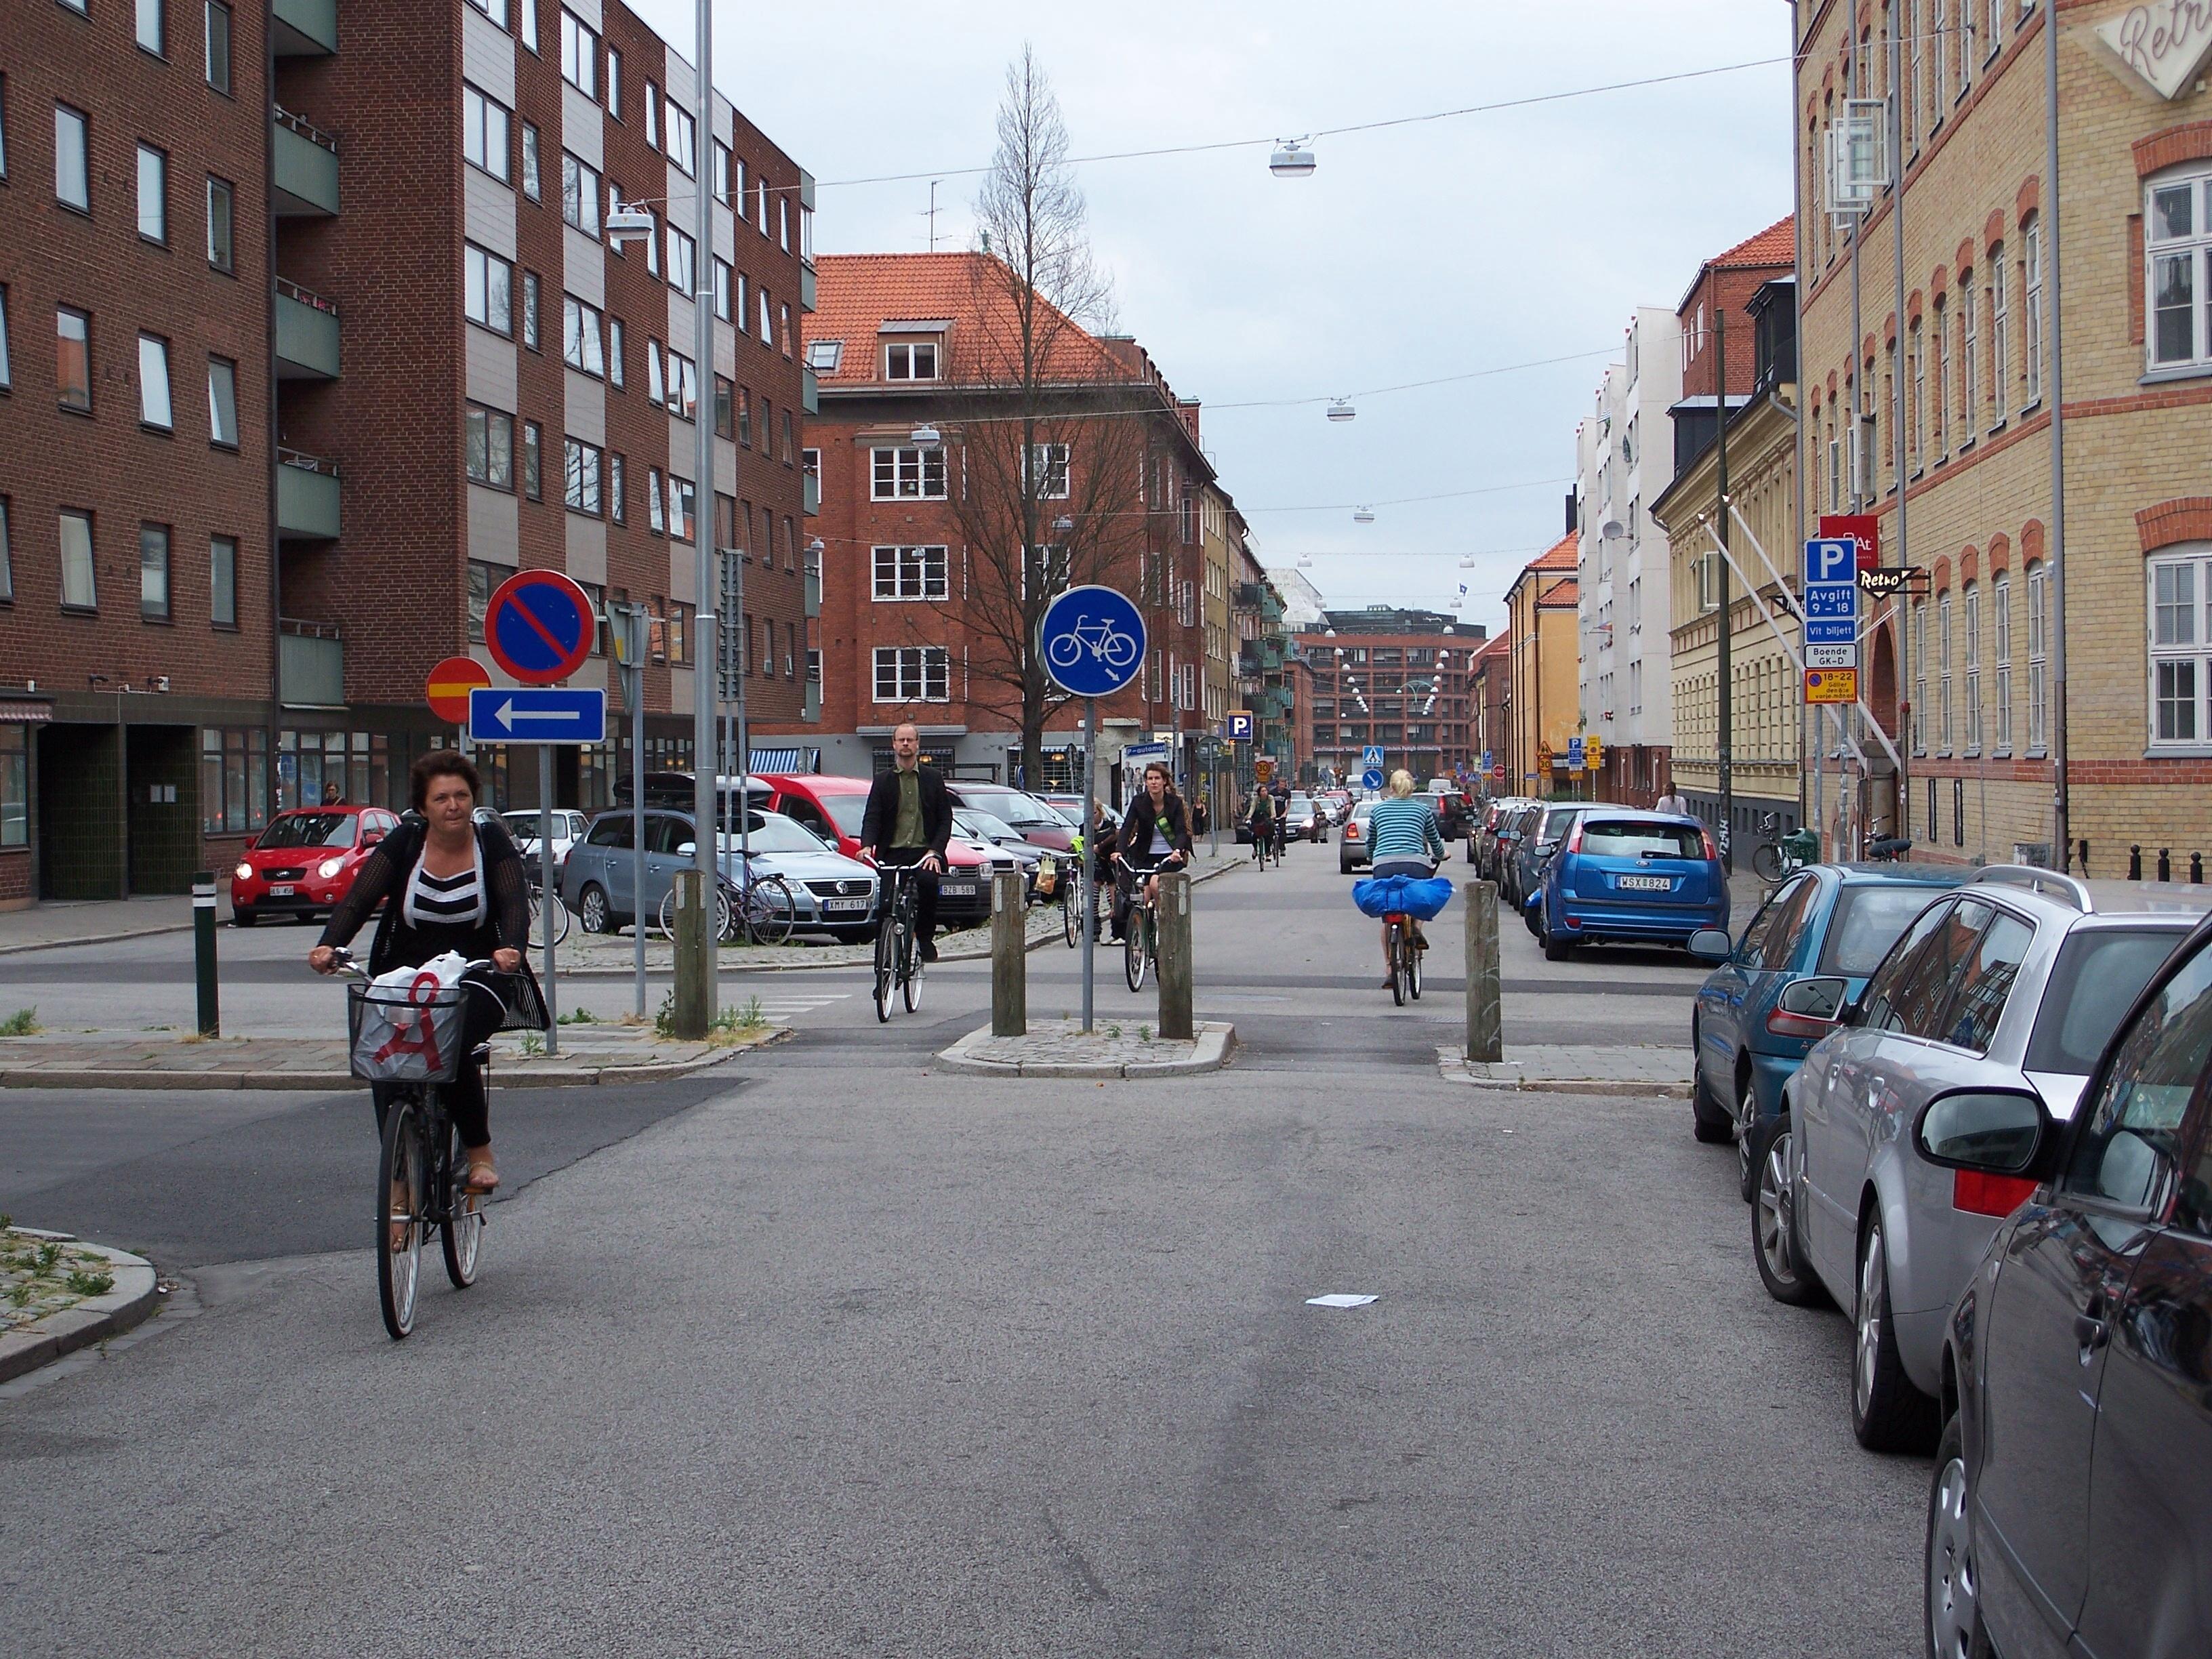 Malmo street scene